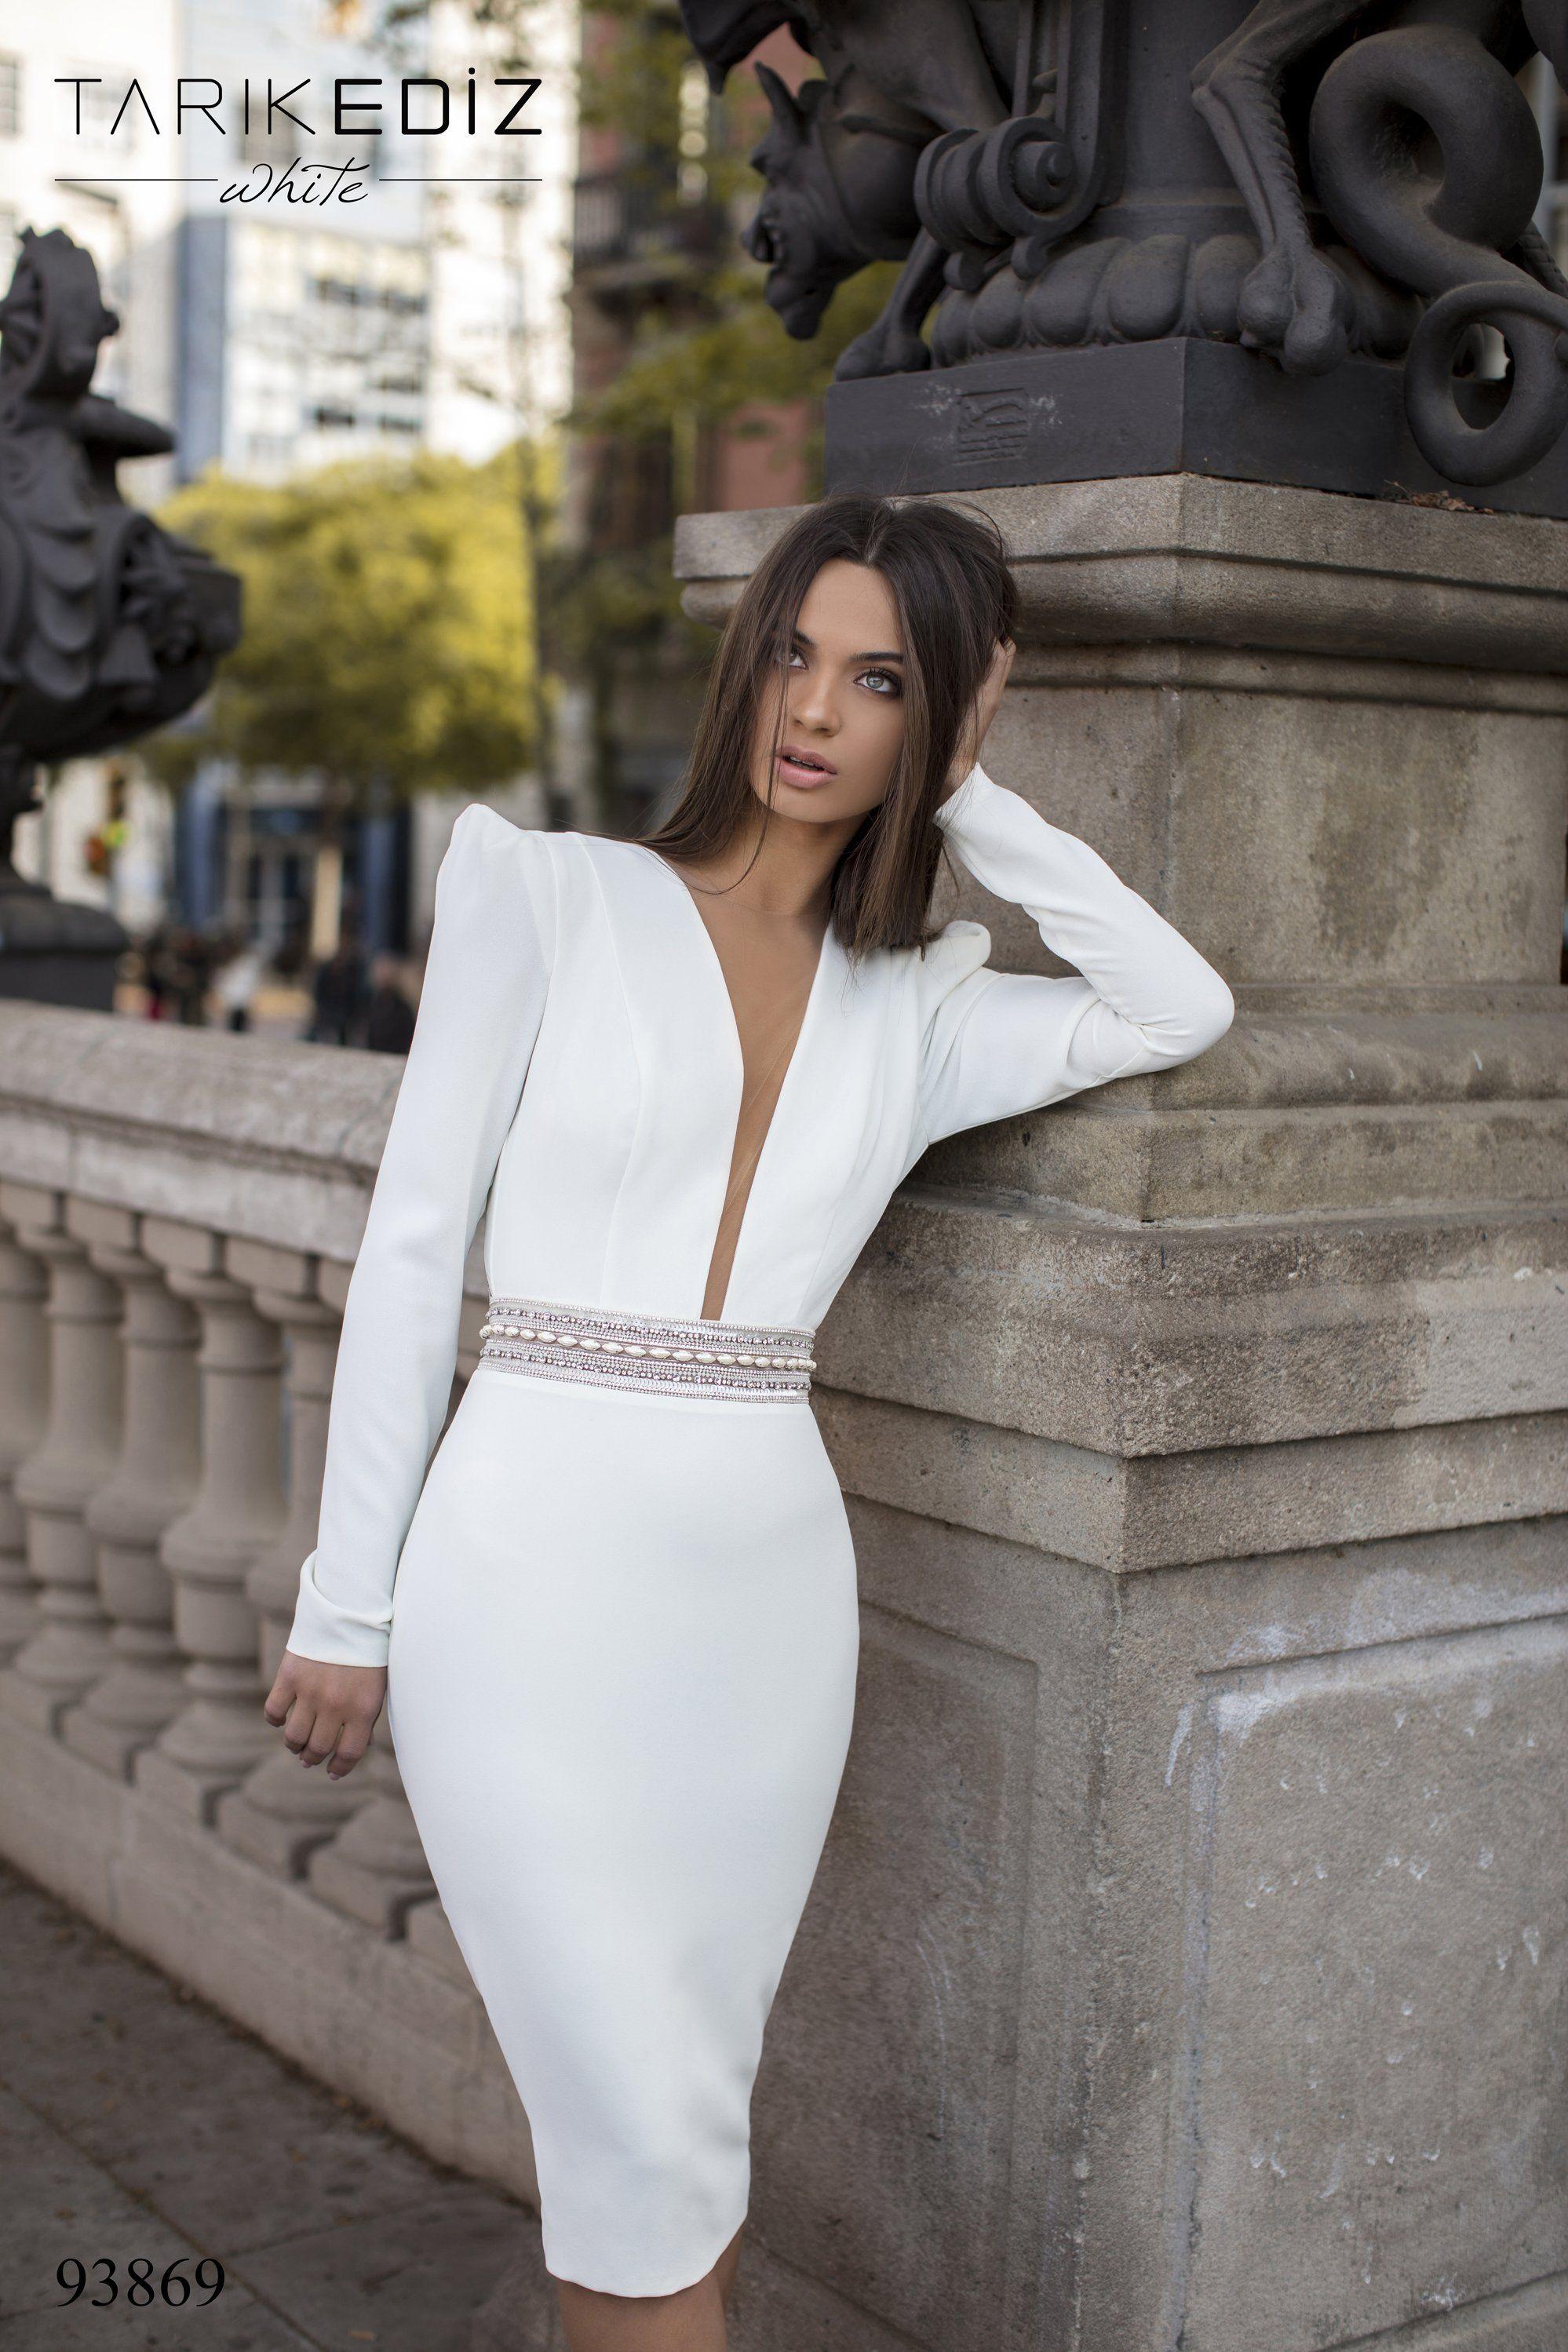 Tarik Ediz 93869 Embellished Deep V Neck Long Sleeve Fitted Dress Long Sleeve Fitted Dress Long Sleeve Wedding Dress Lace White Short Dress [ 2997 x 1998 Pixel ]